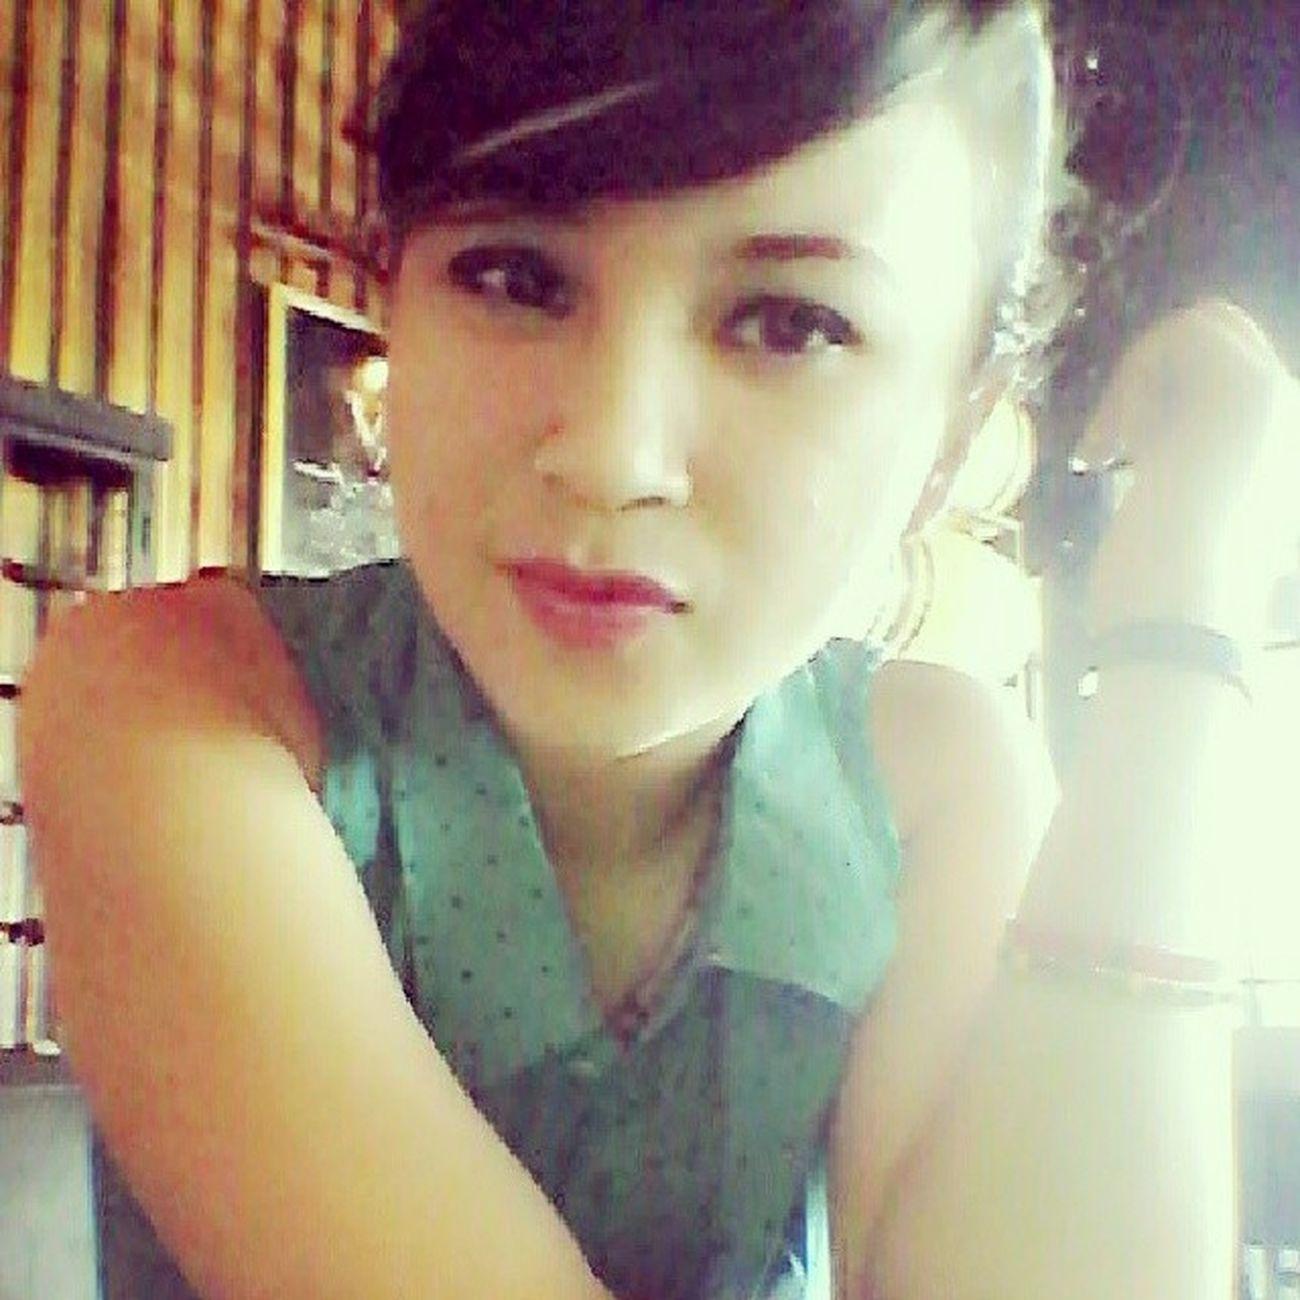 Yeaahhh tembem ... Selfie Asiangirl Jw Chuby igers doubletap like4like f4f